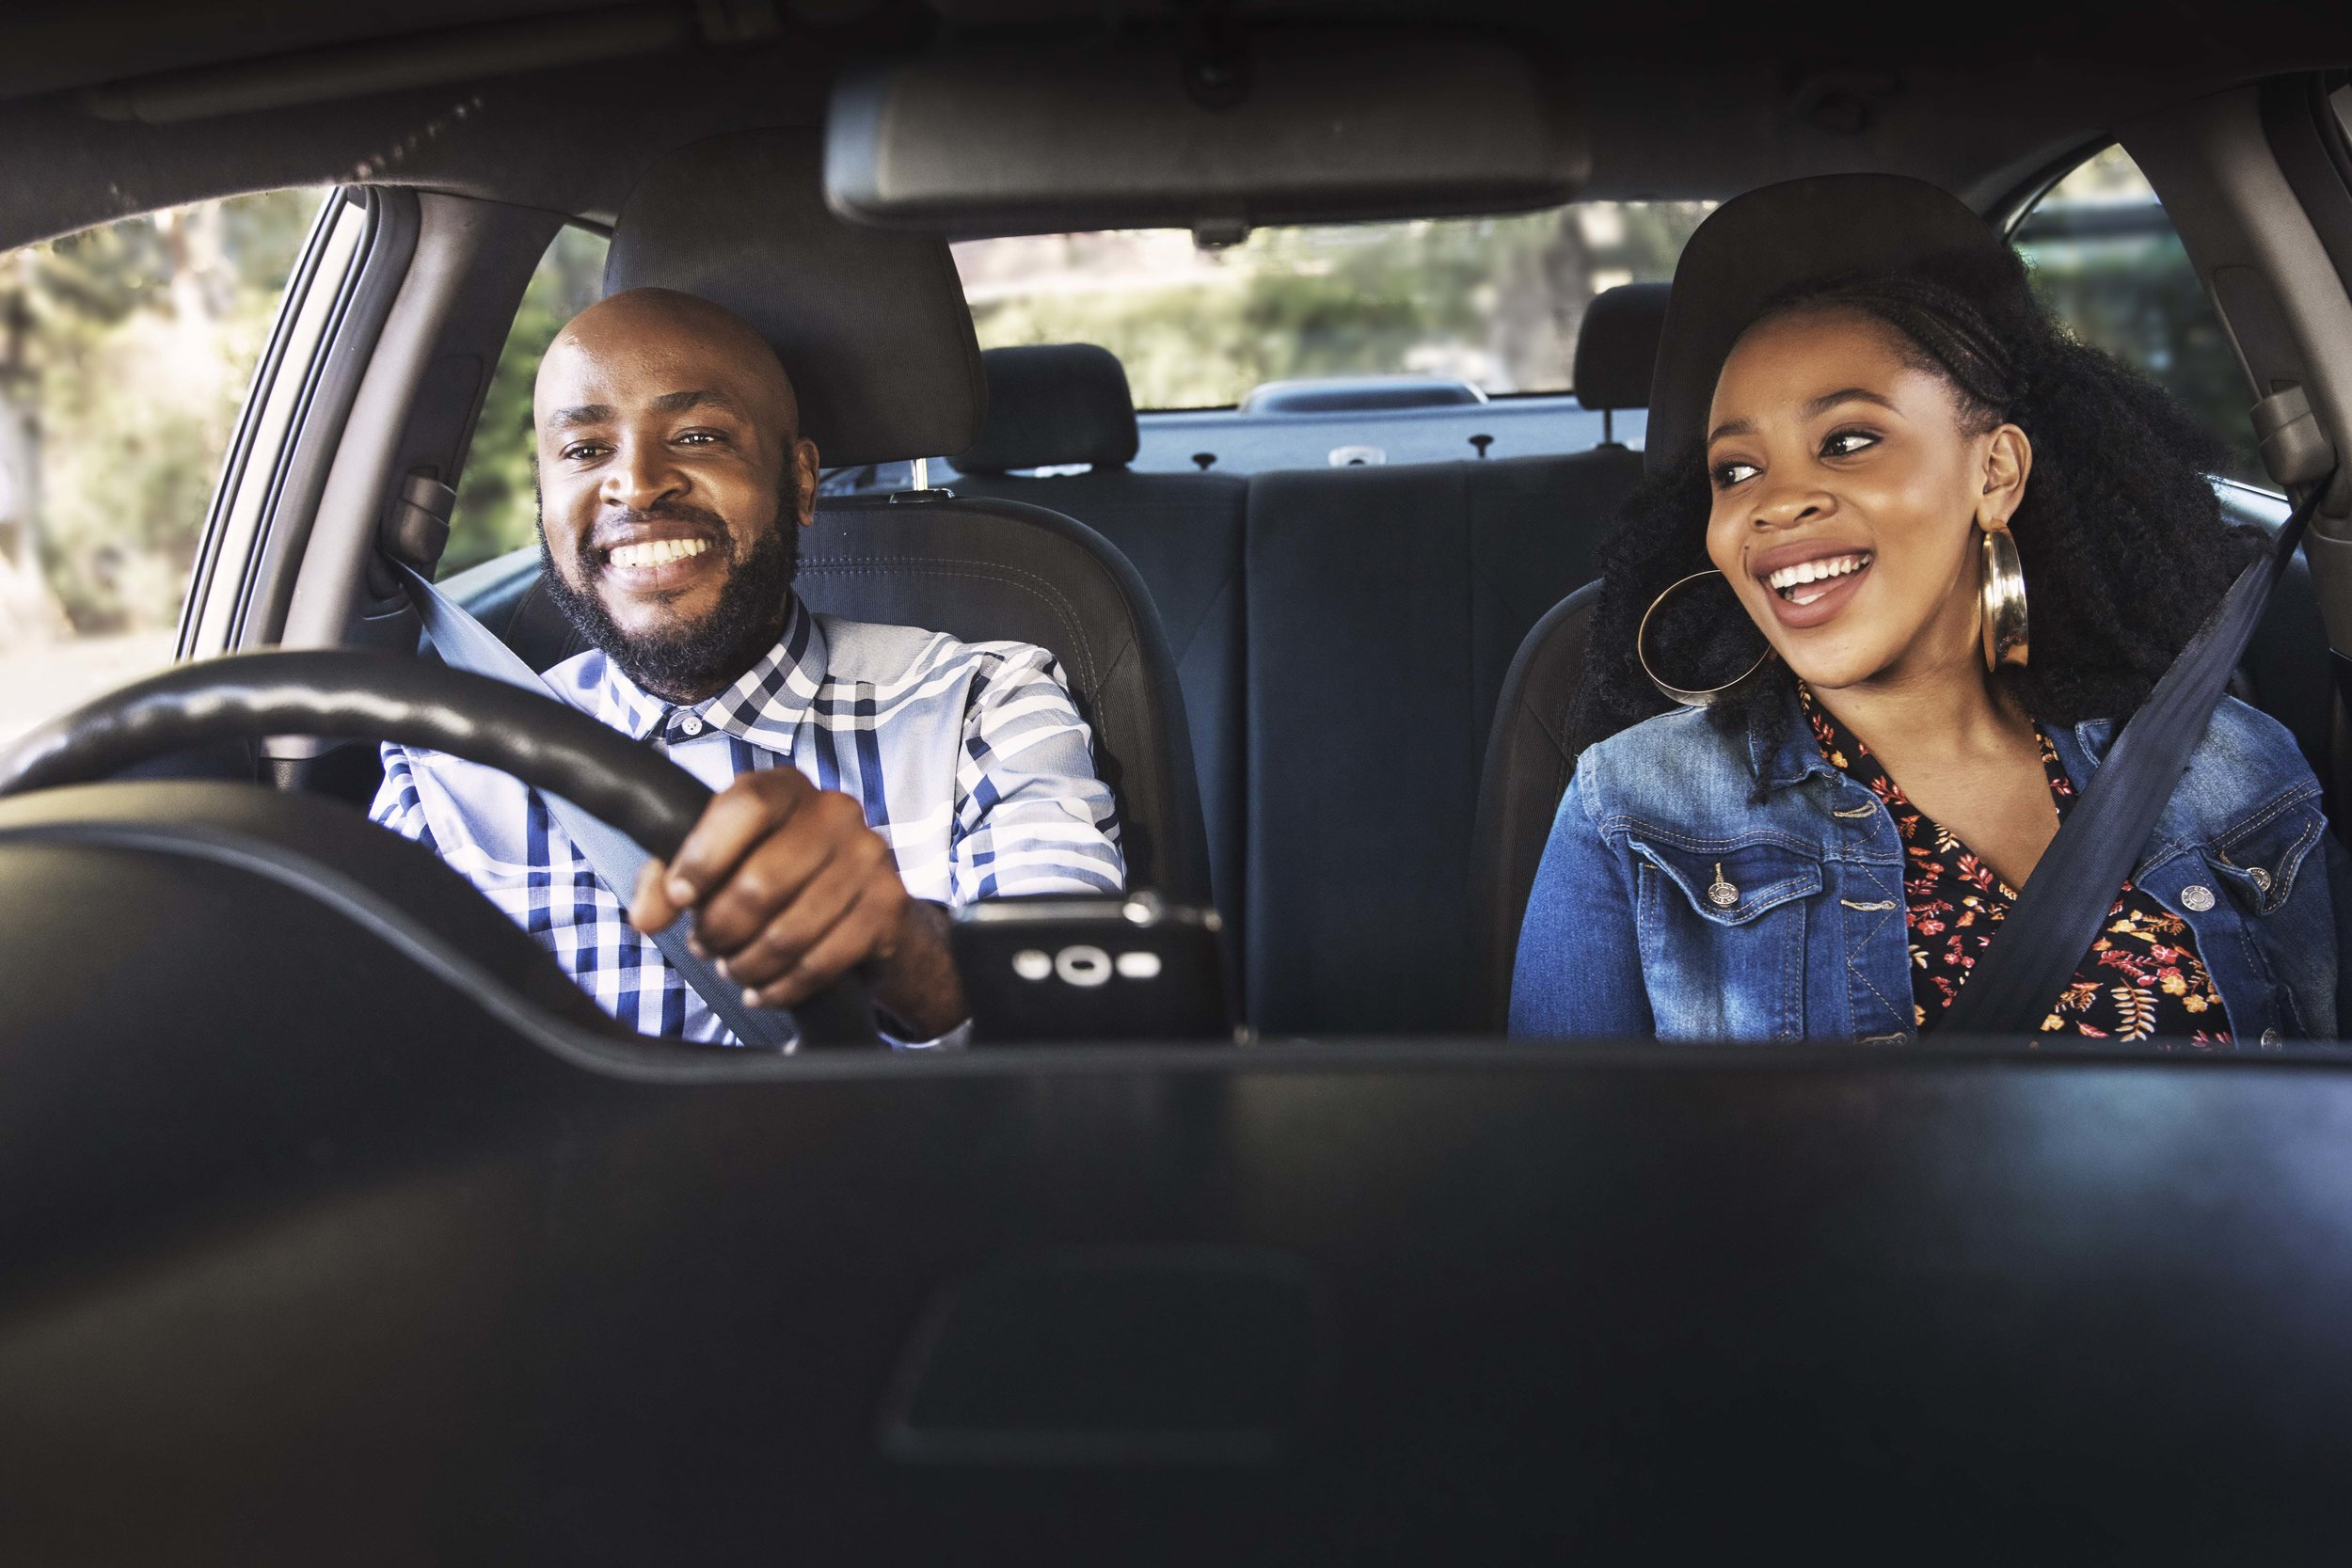 Uber_shoot_South_Africa_Pair-101-2_optimized.jpg